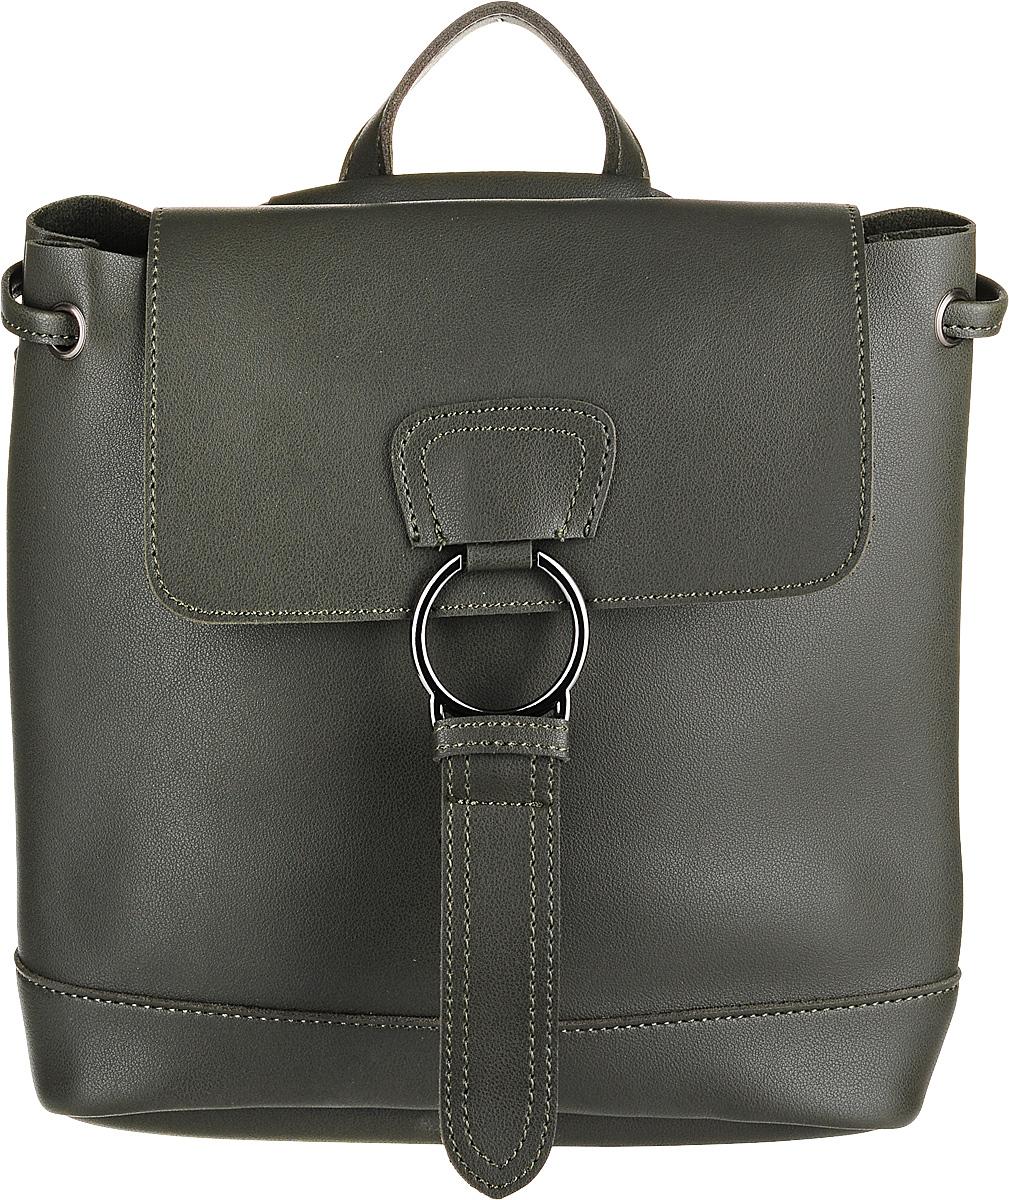 Рюкзак женский OrsOro, цвет: оливковый. DW-829/2 рюкзак женский orsoro цвет оливковый dw 830 2